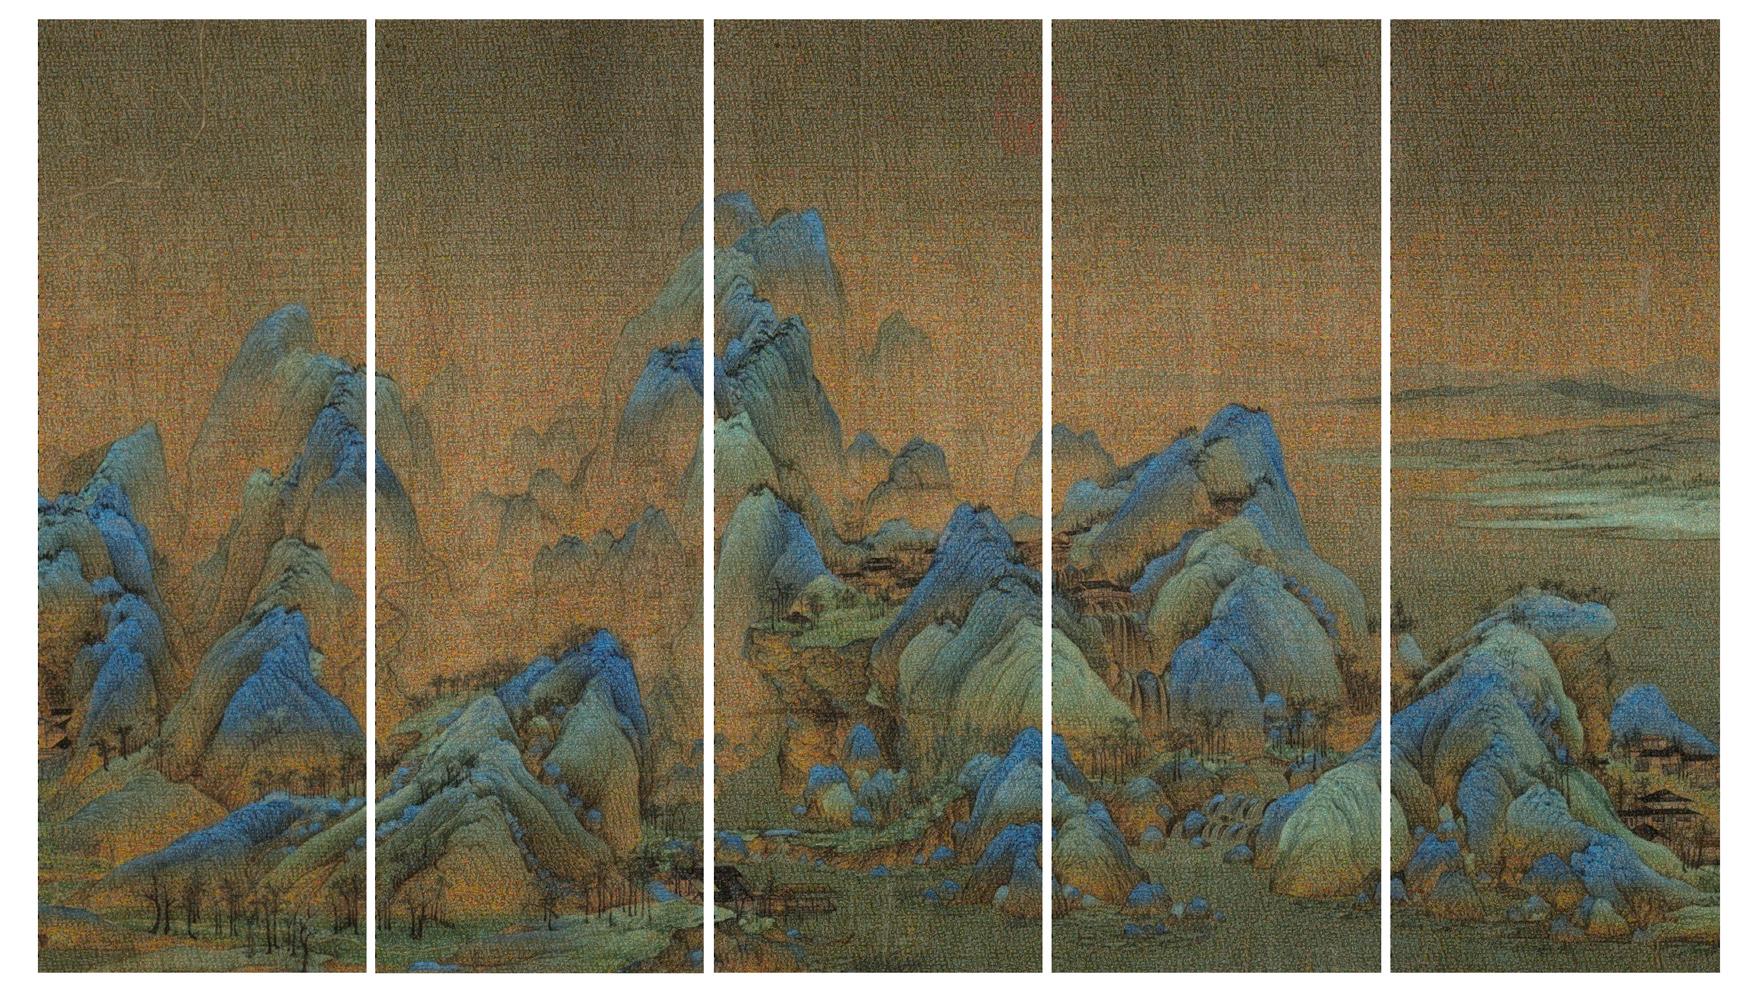 GUO JIAN   The Landscape No.1  2014 Inkjet pigment print 200 cm x 345 cm